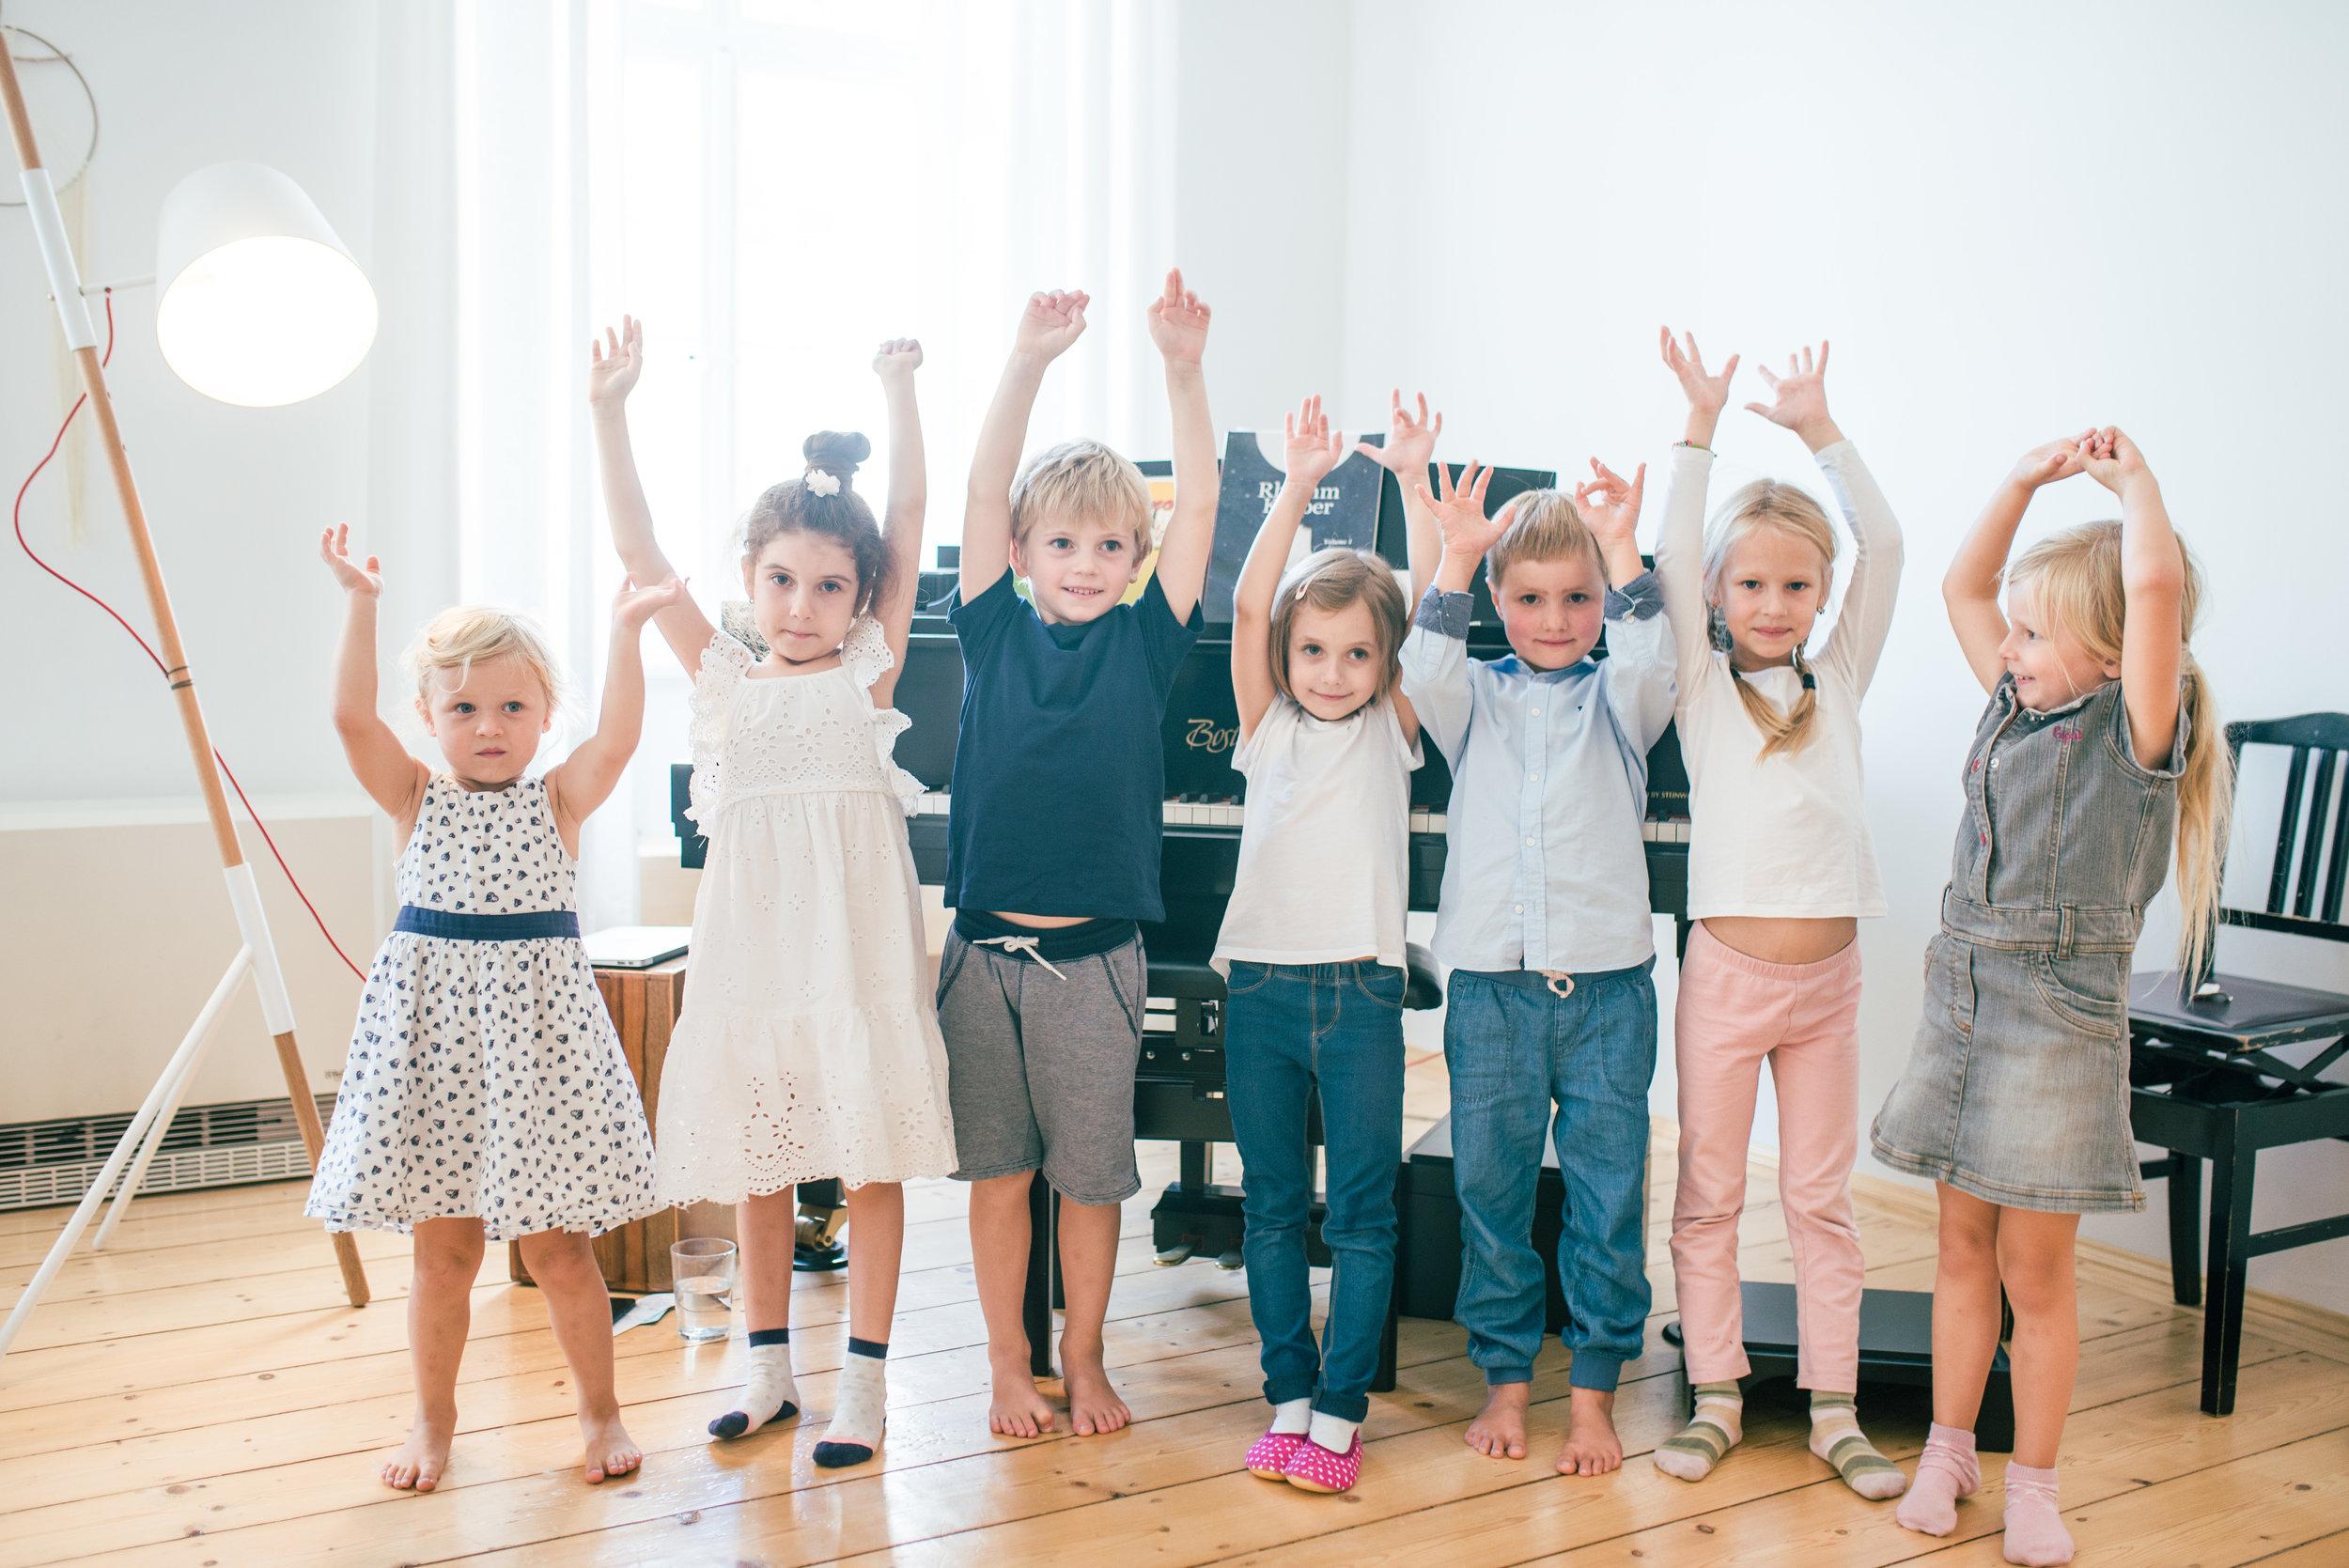 These Kids Spark Joy! -